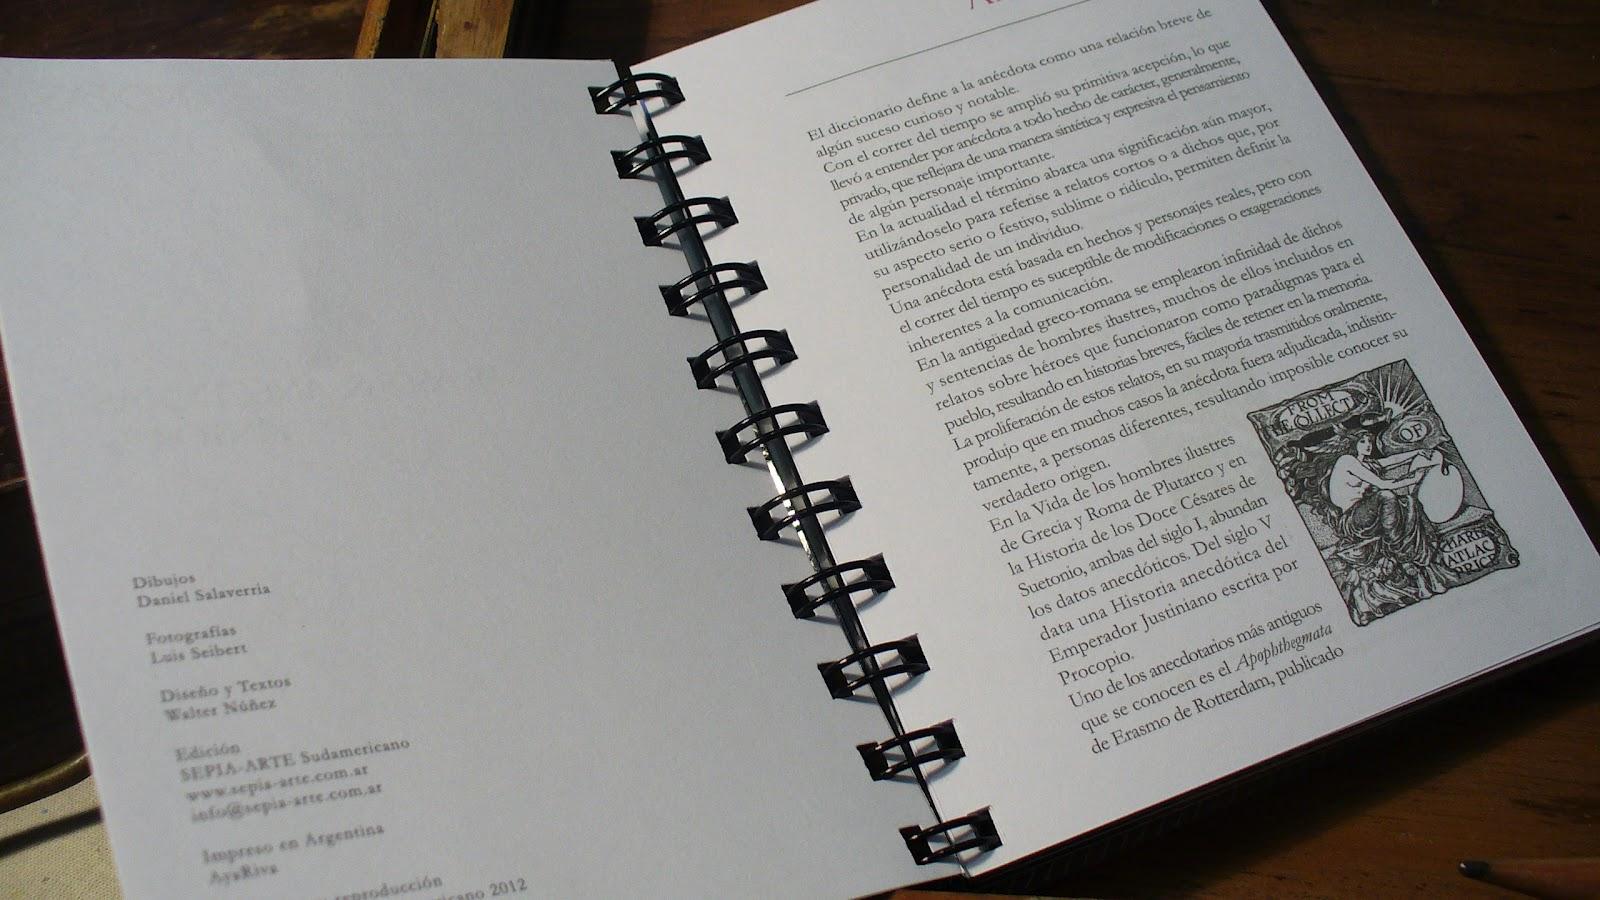 Libretas De Dibujo De Un Artista Freelance: NOTAS & ARTE: Febrero 2012